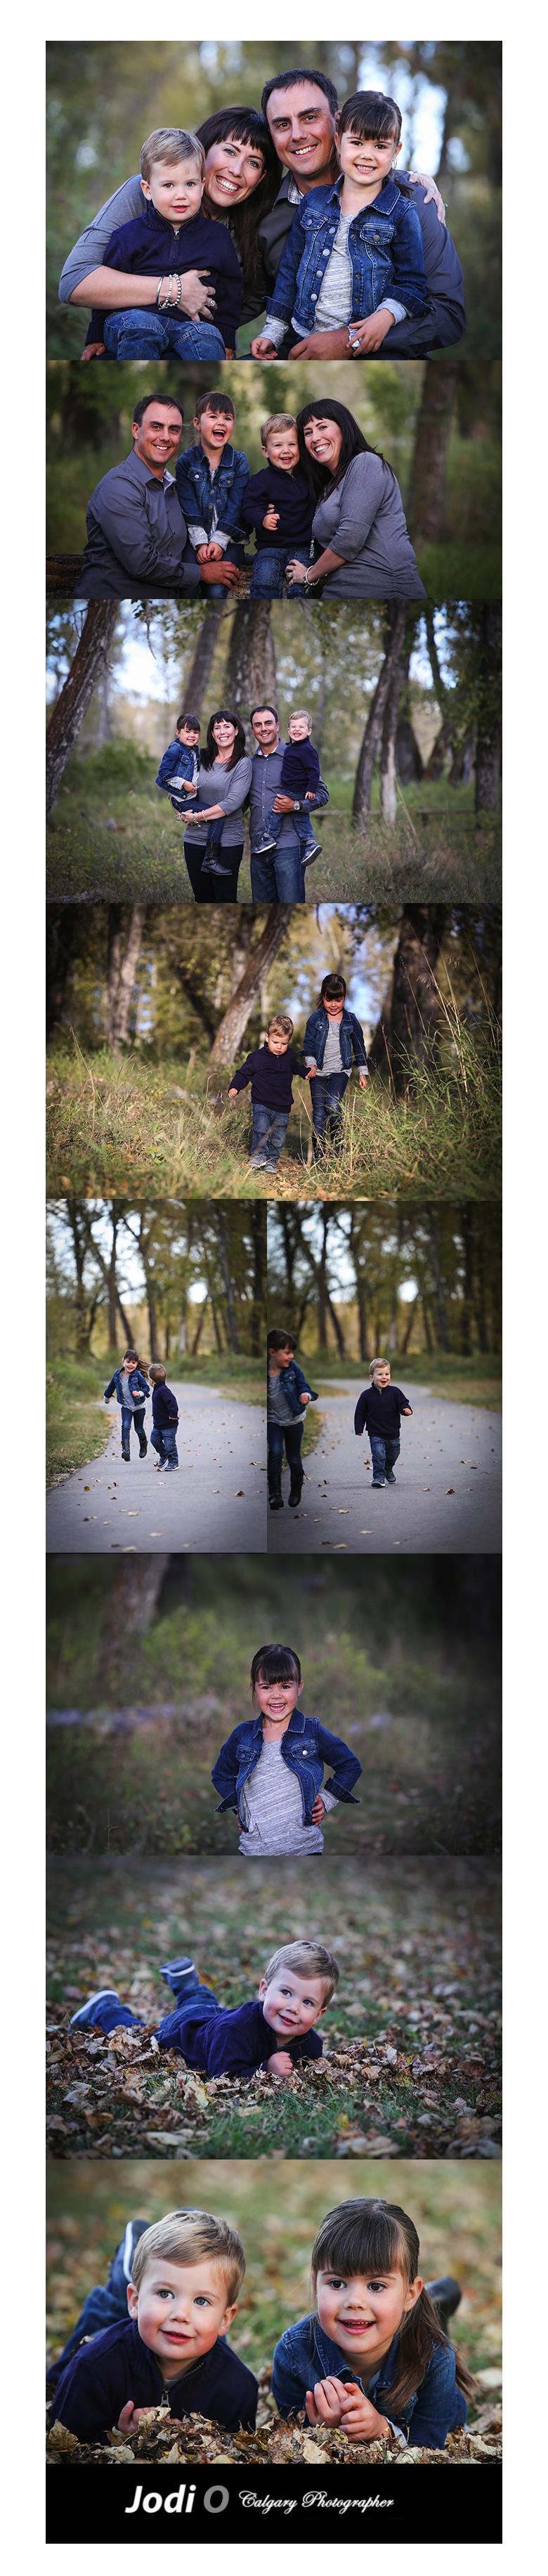 Calgary Affordable Family Photographer